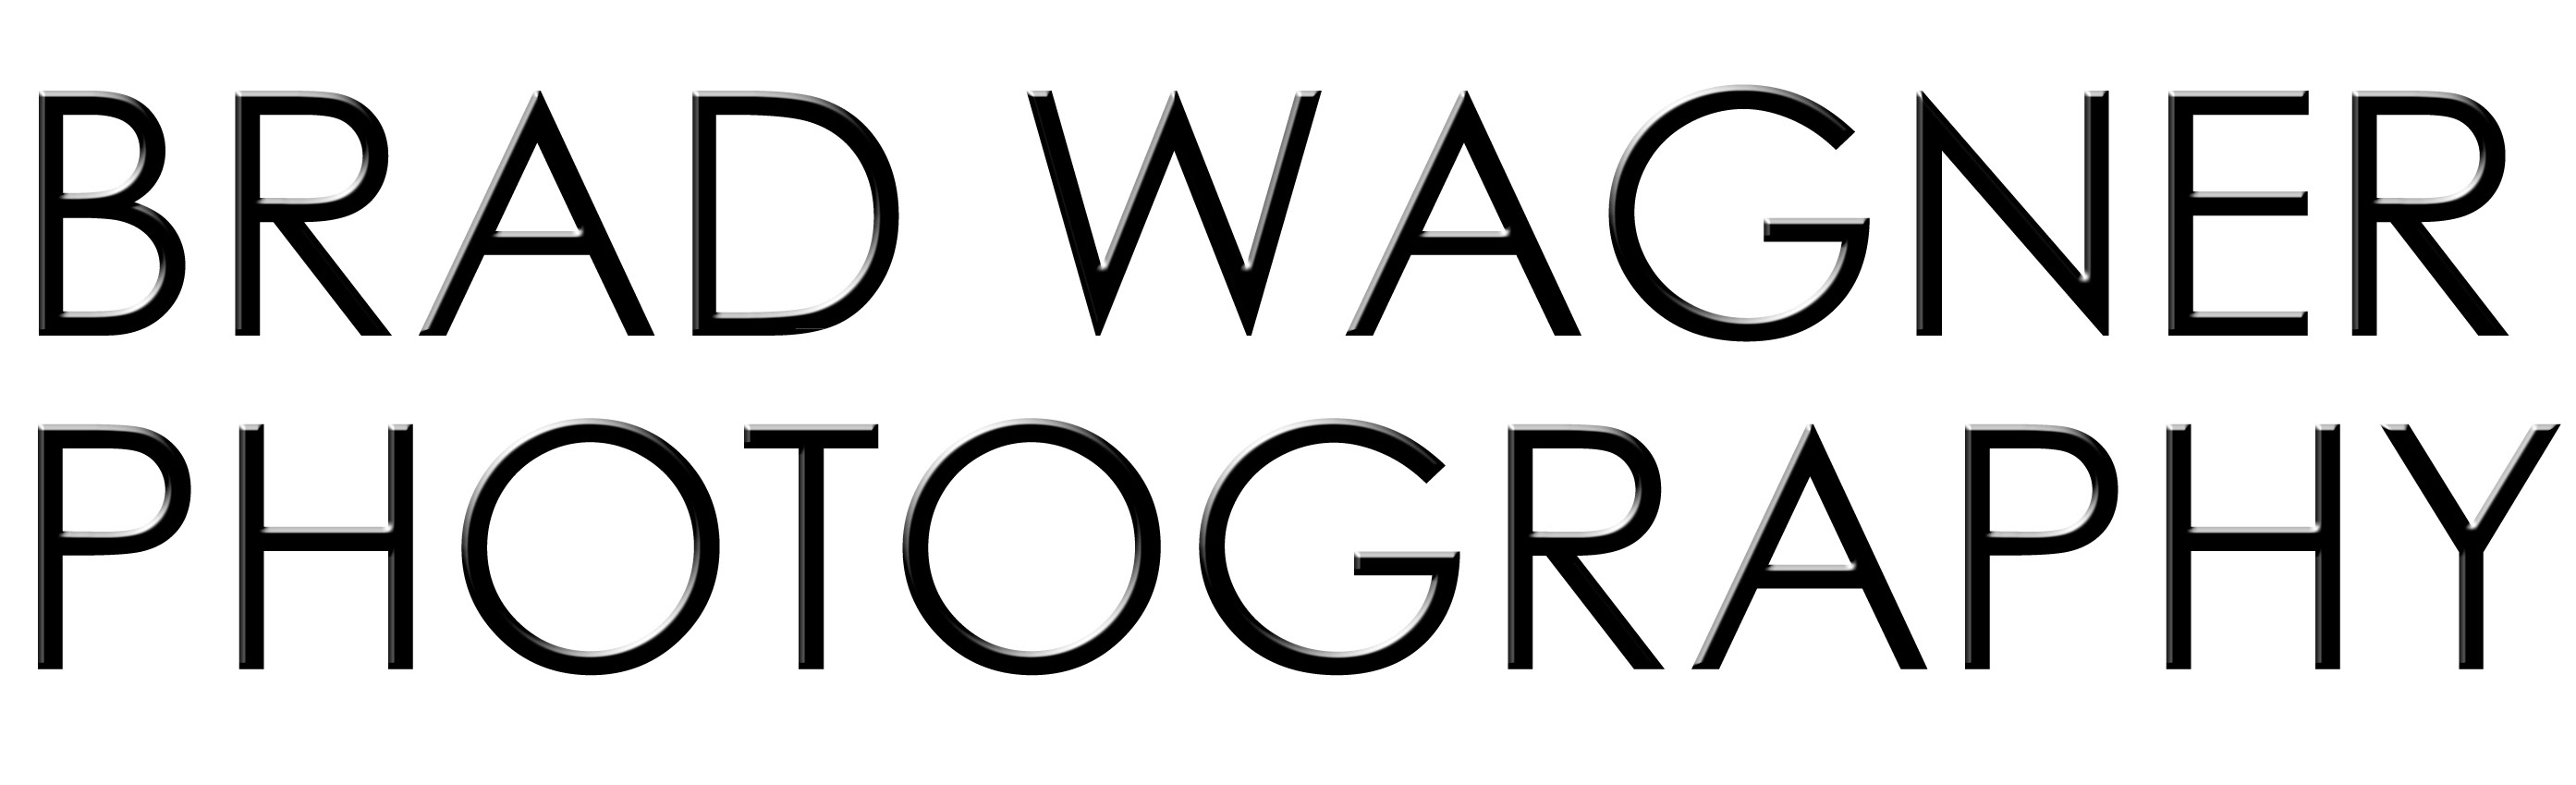 Brad Wagner